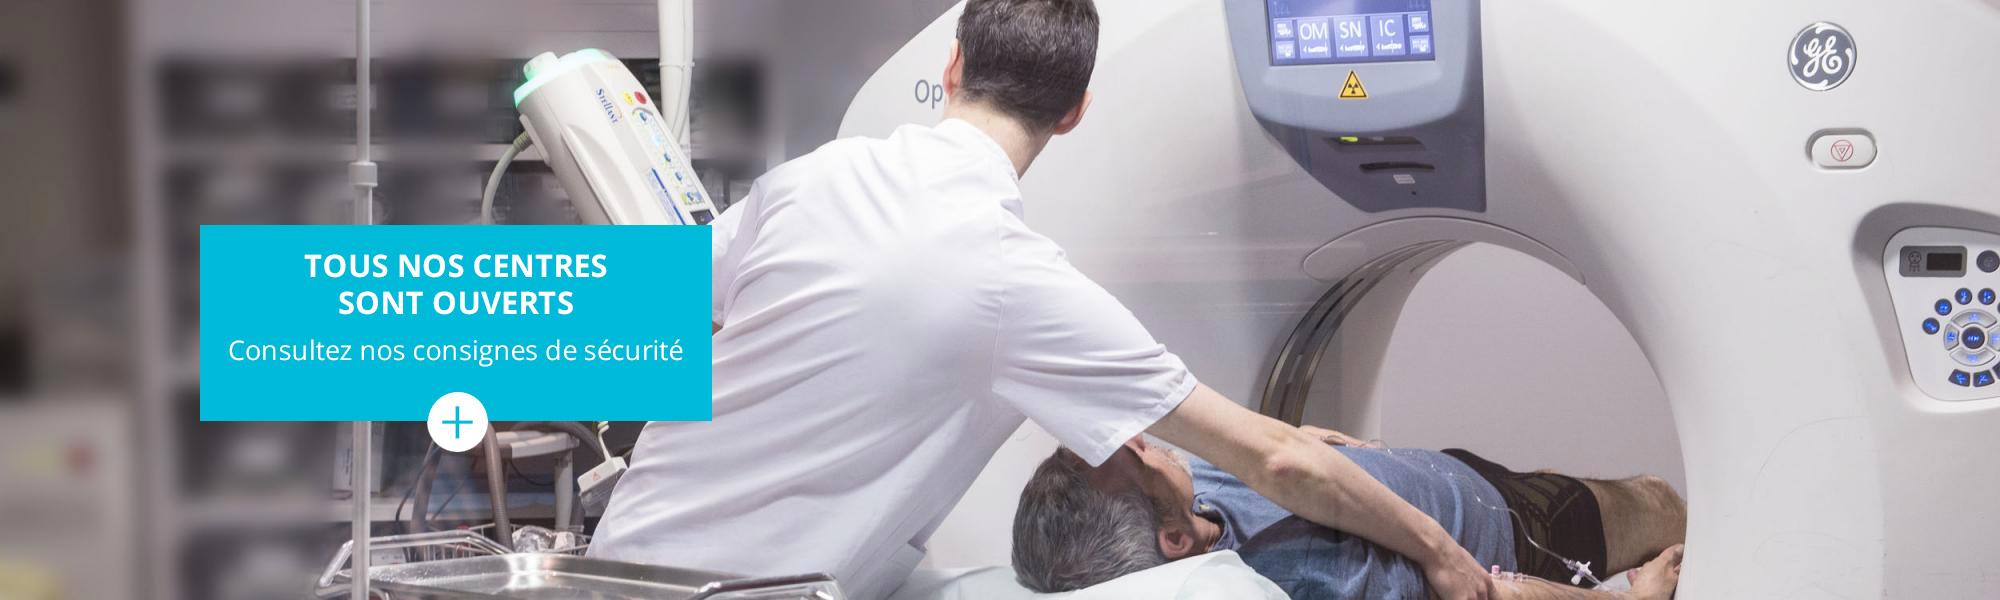 radiologue examen imagerie